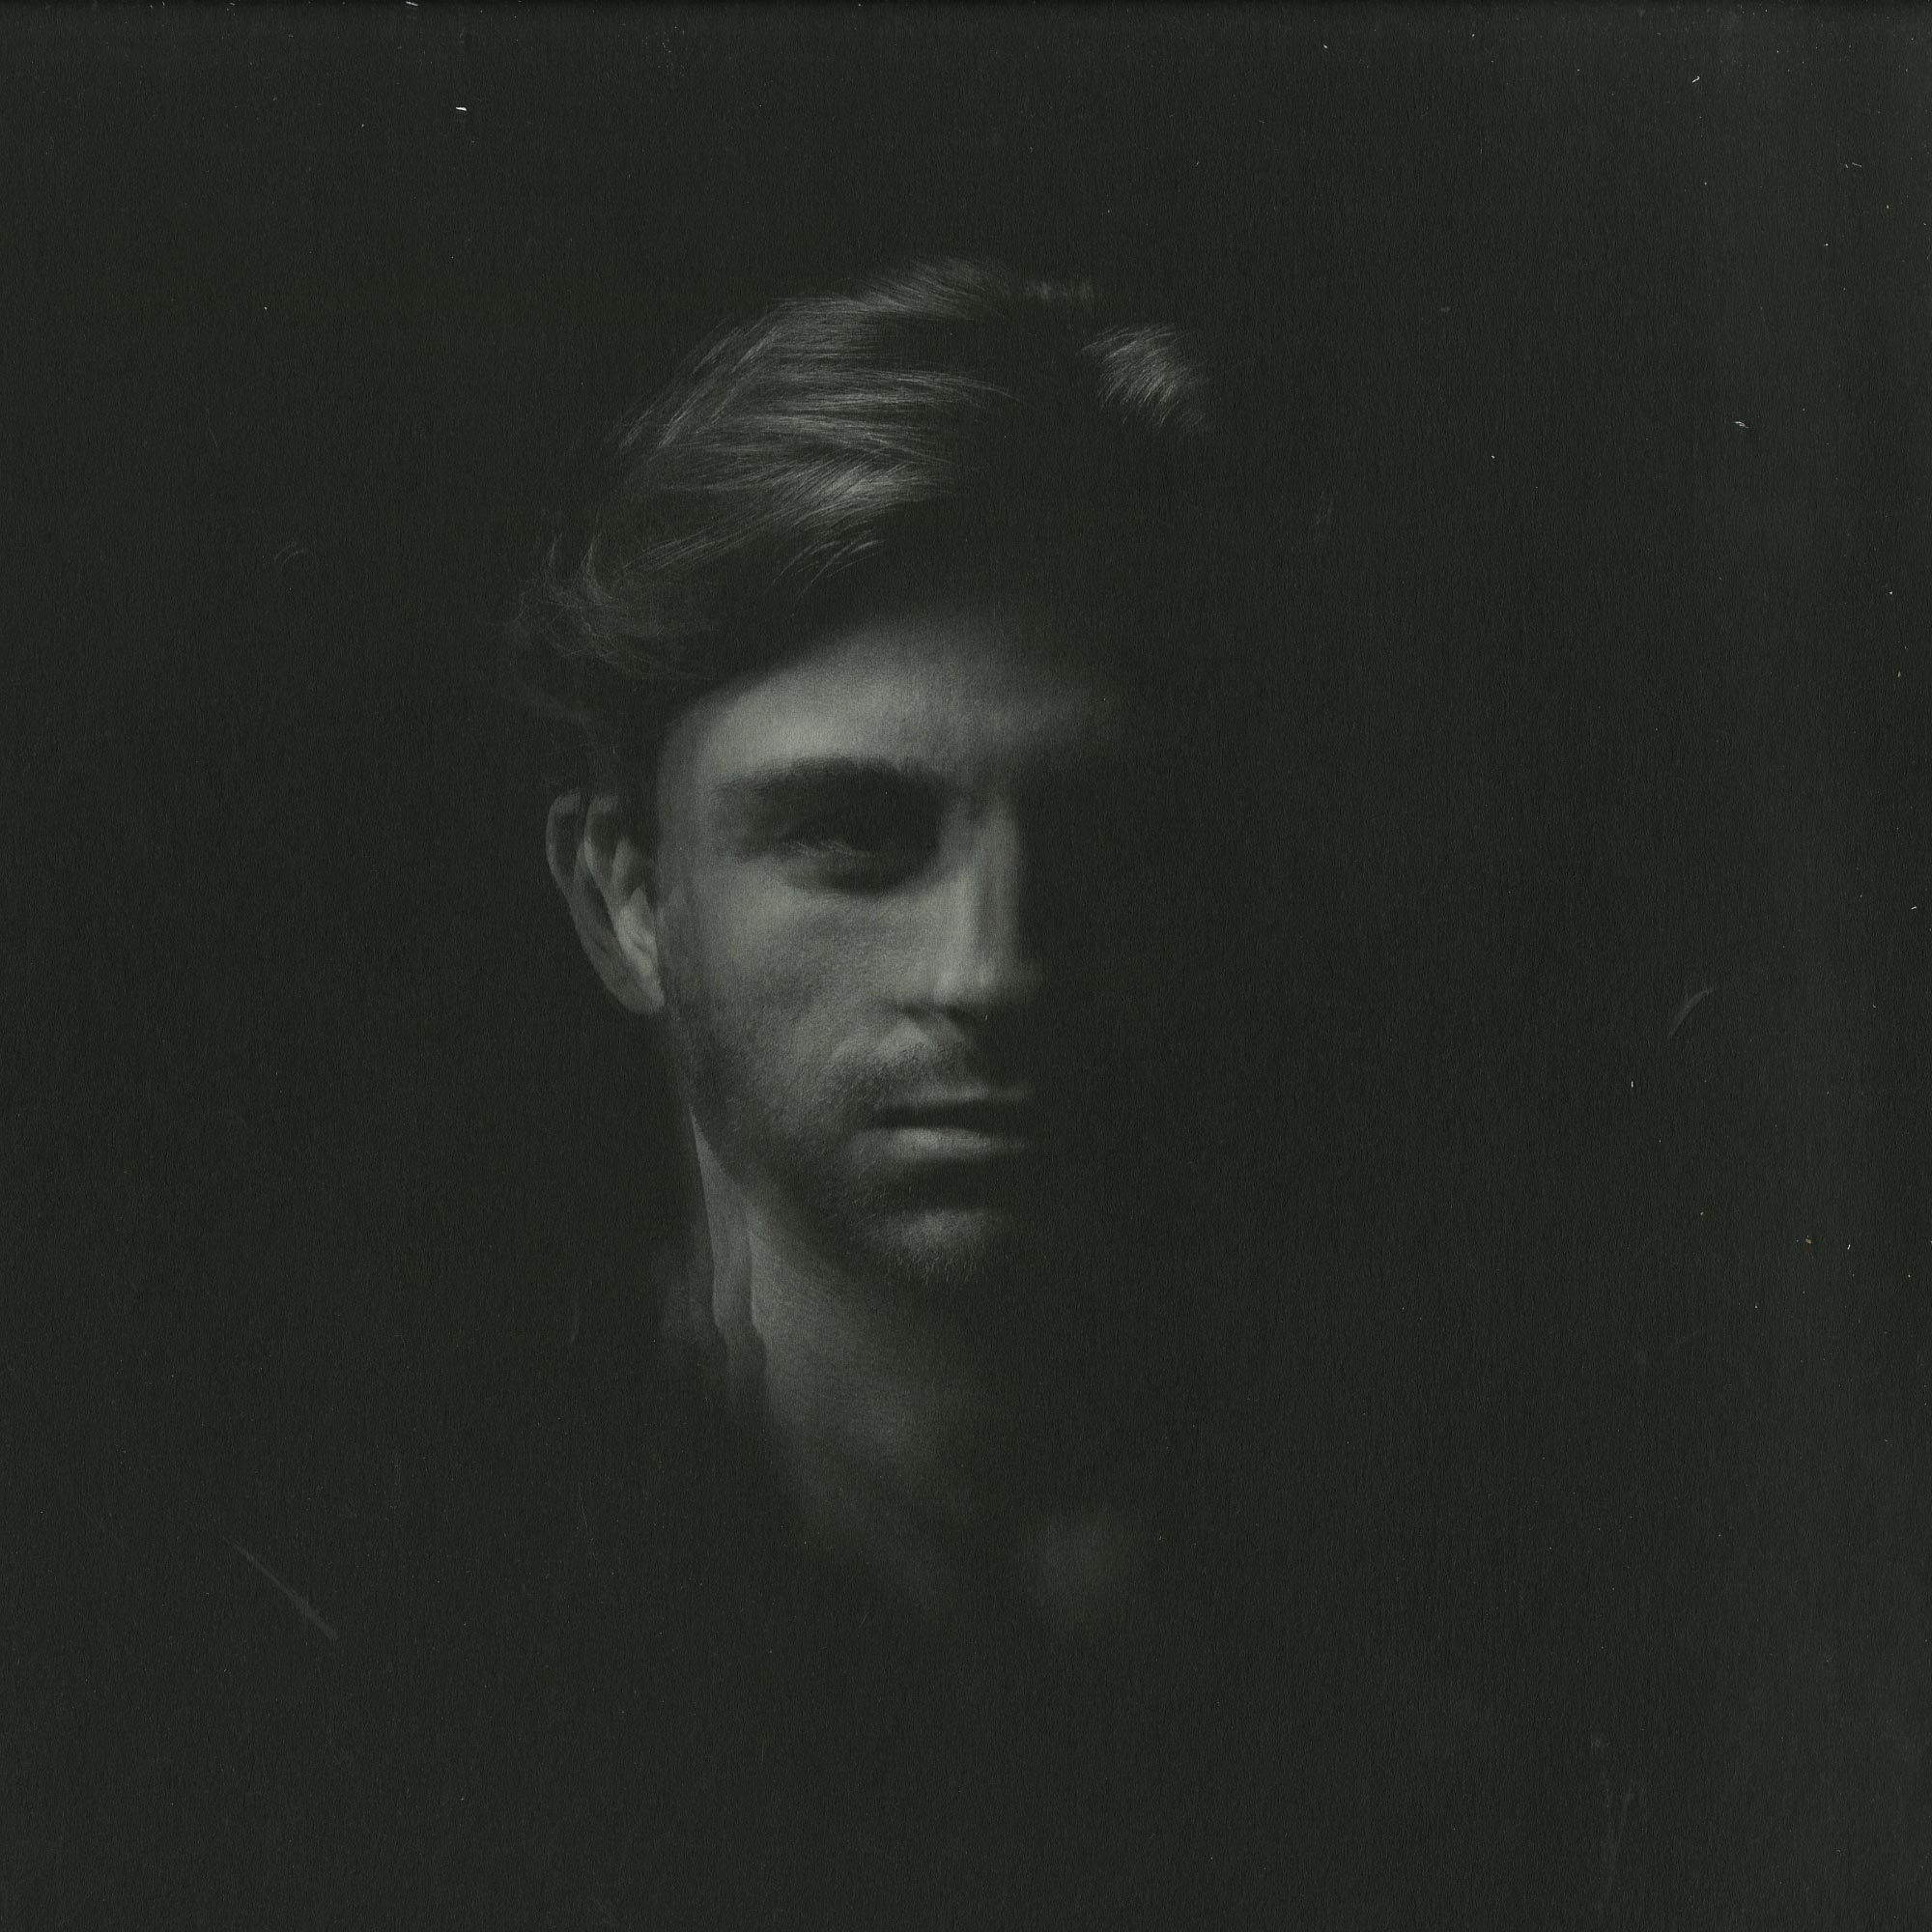 Sascha Dive - DARK SHADOW